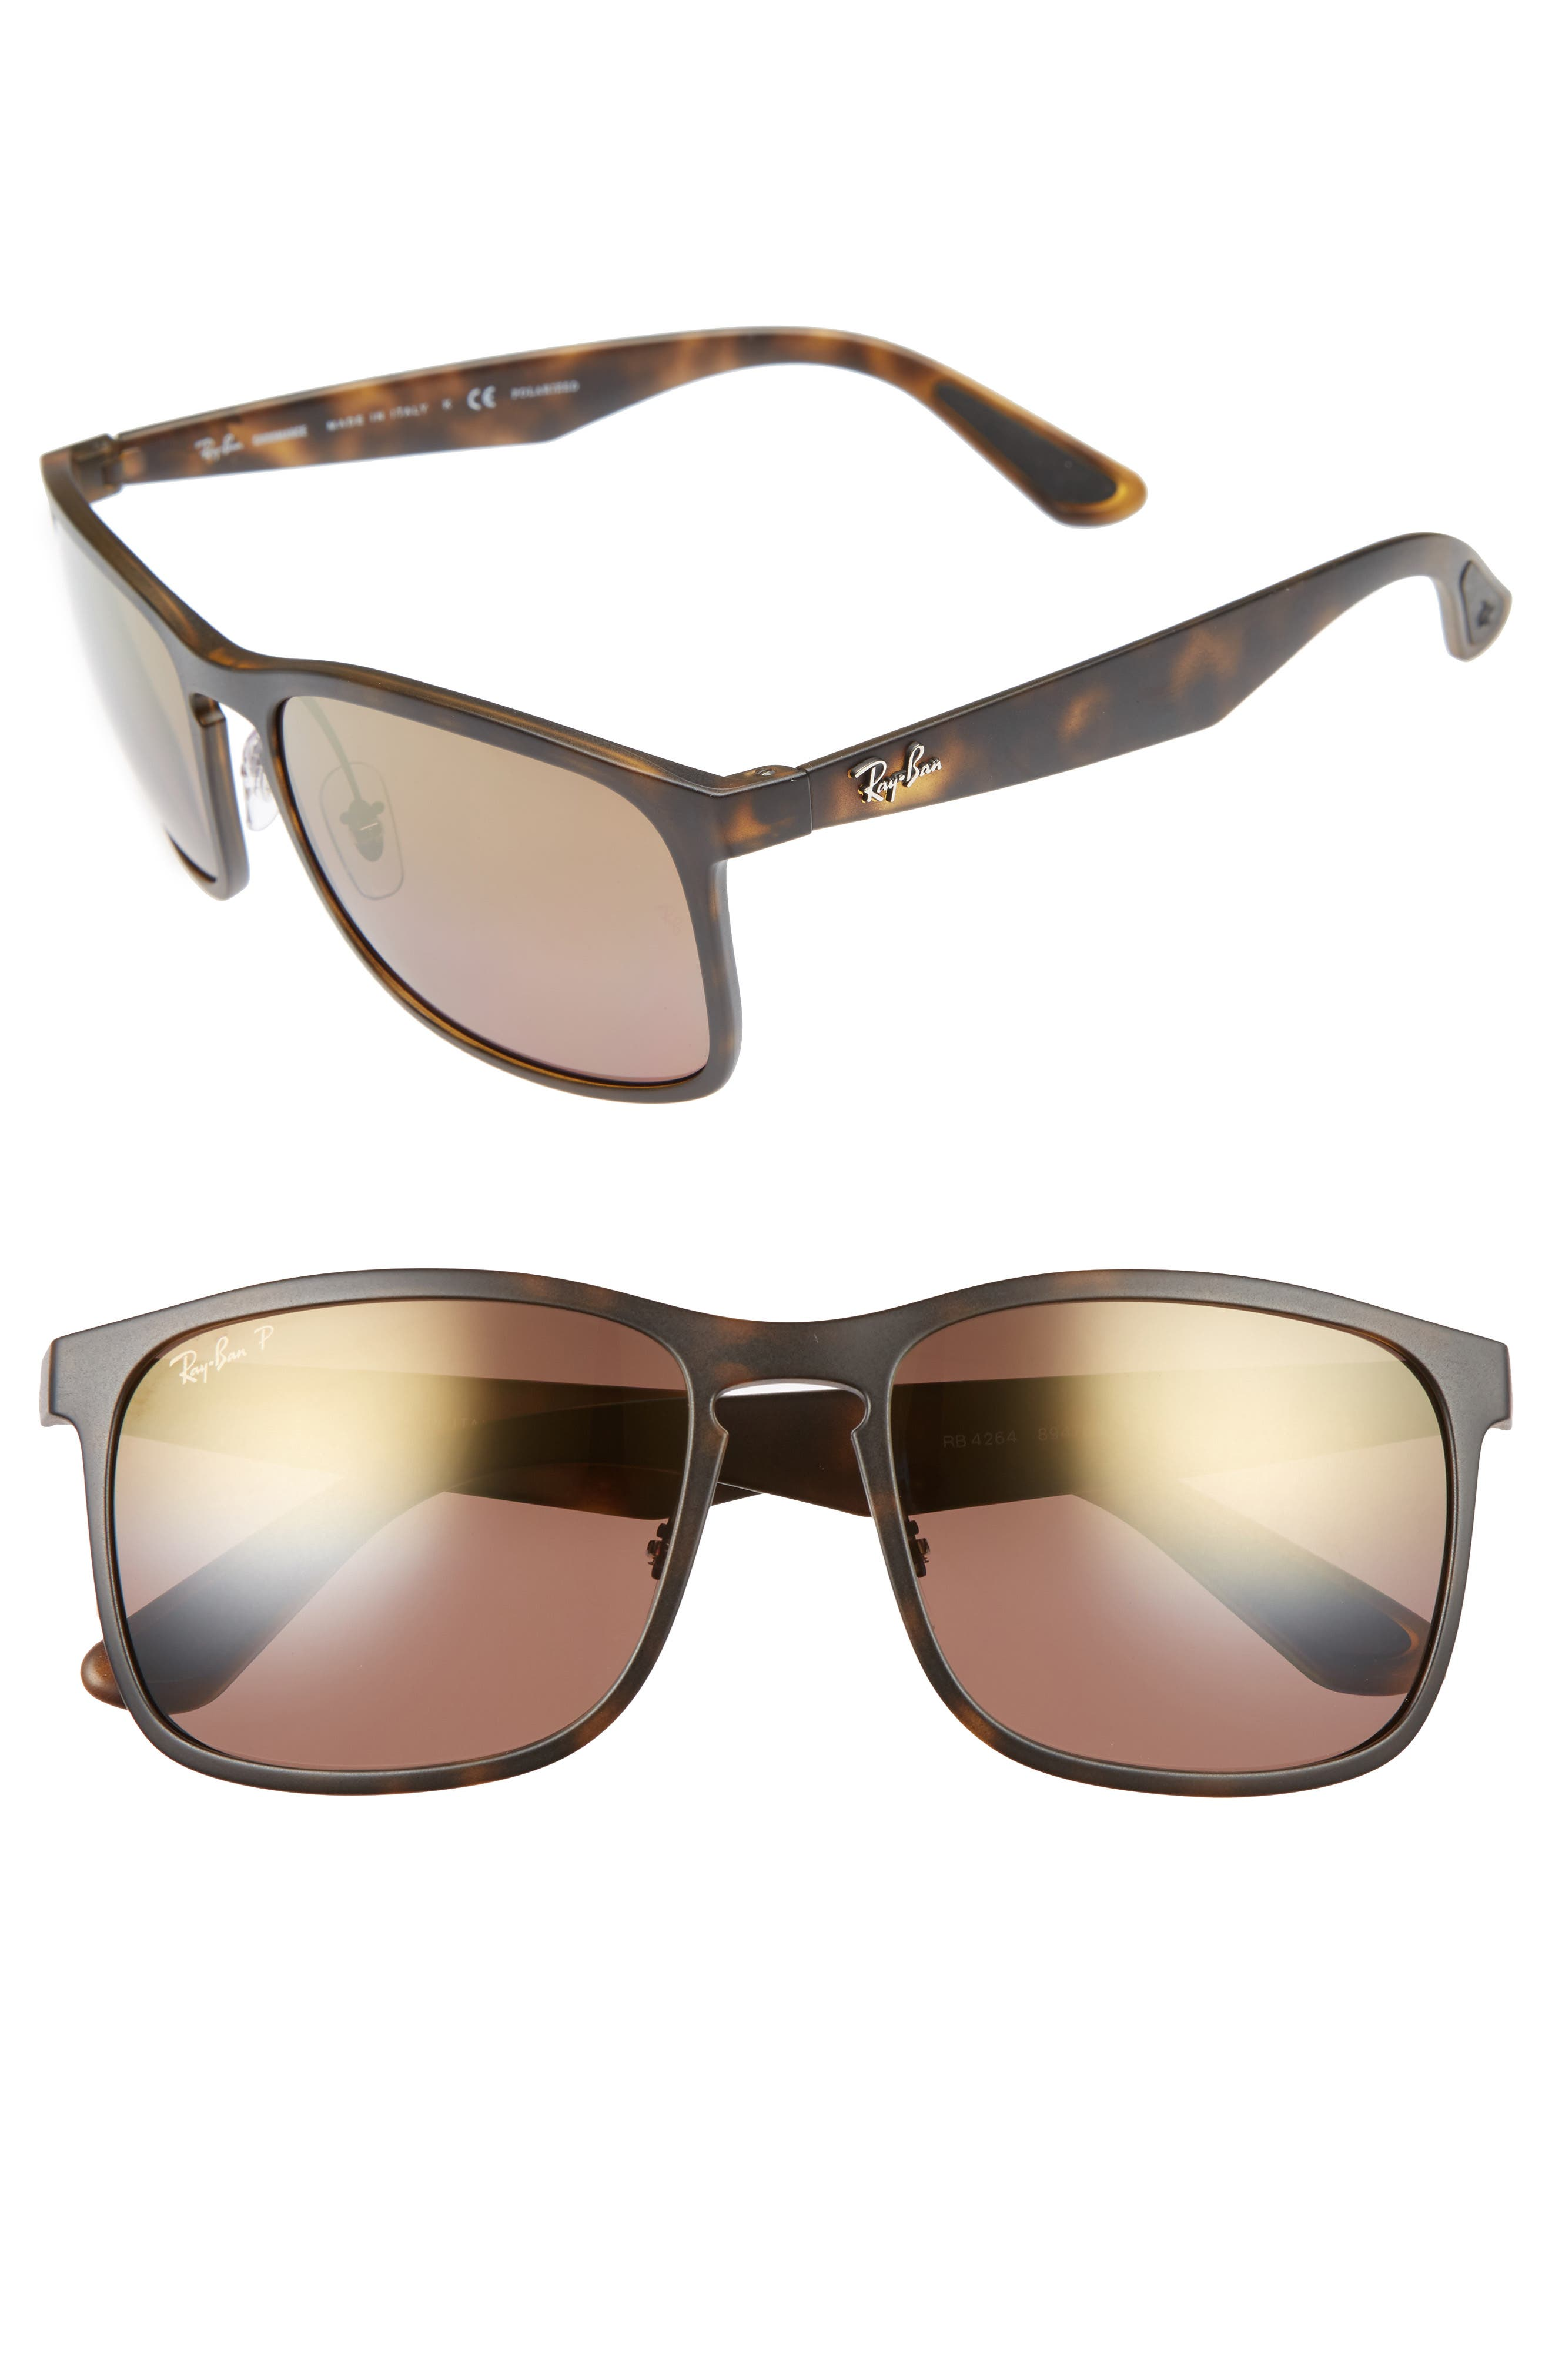 58mm Chromance Sunglasses,                         Main,                         color, Matte Havana/Brown Mirror Gold